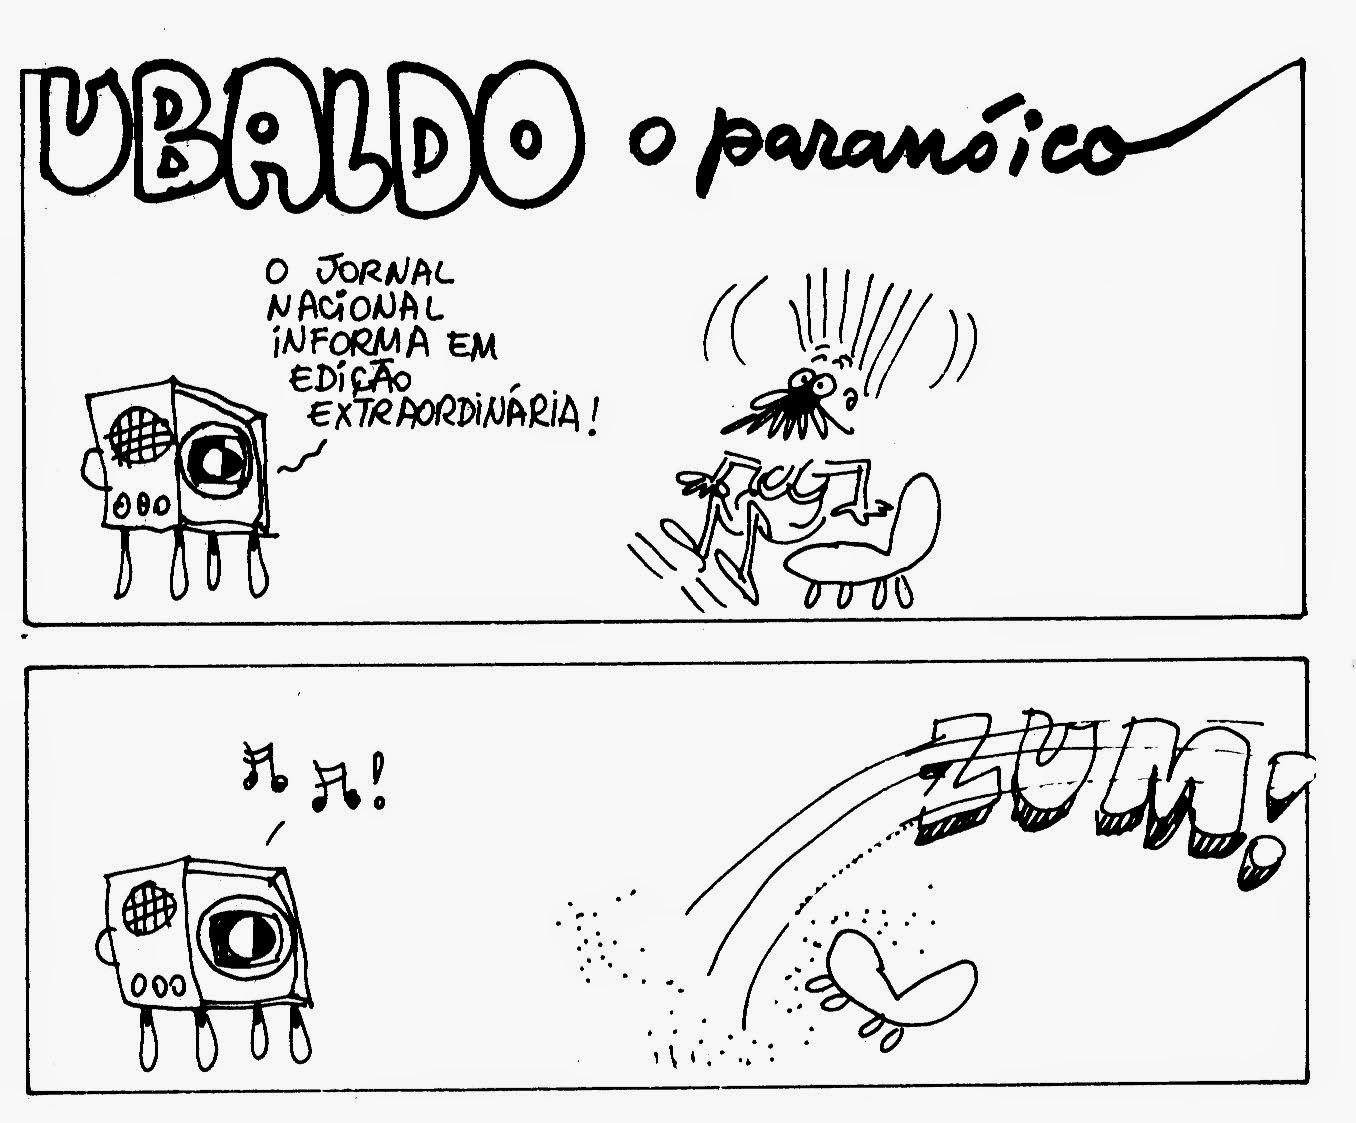 TIRAS Memory: Ubaldo, o paranoico - Isto É - 1977